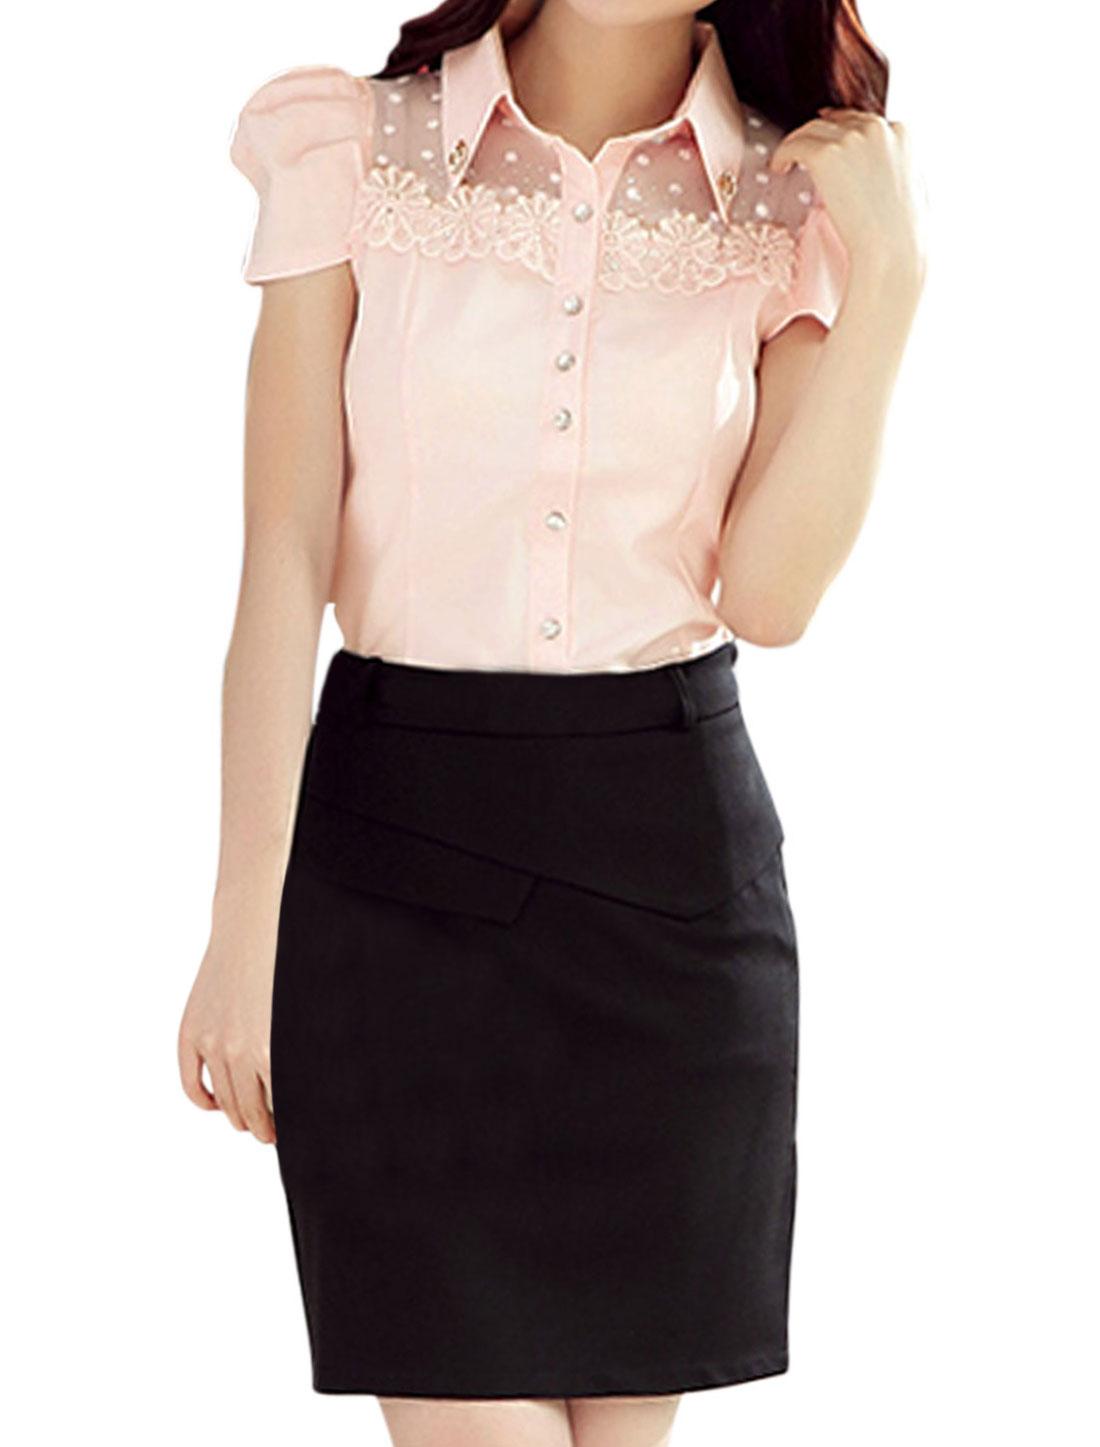 Women Rhinestones Embellished Lace Panel Button Down Shirt Light Pink L